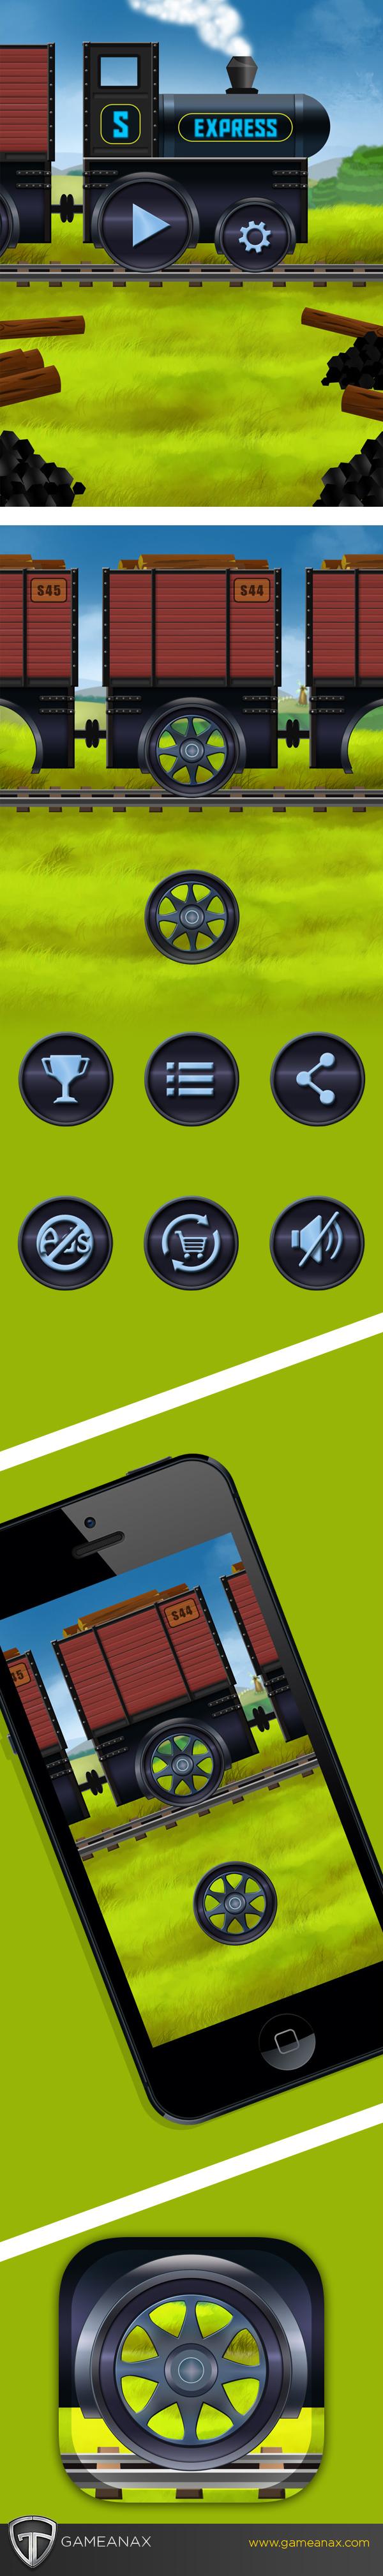 mobile gaming Gaming Games iphone ipads UI ux